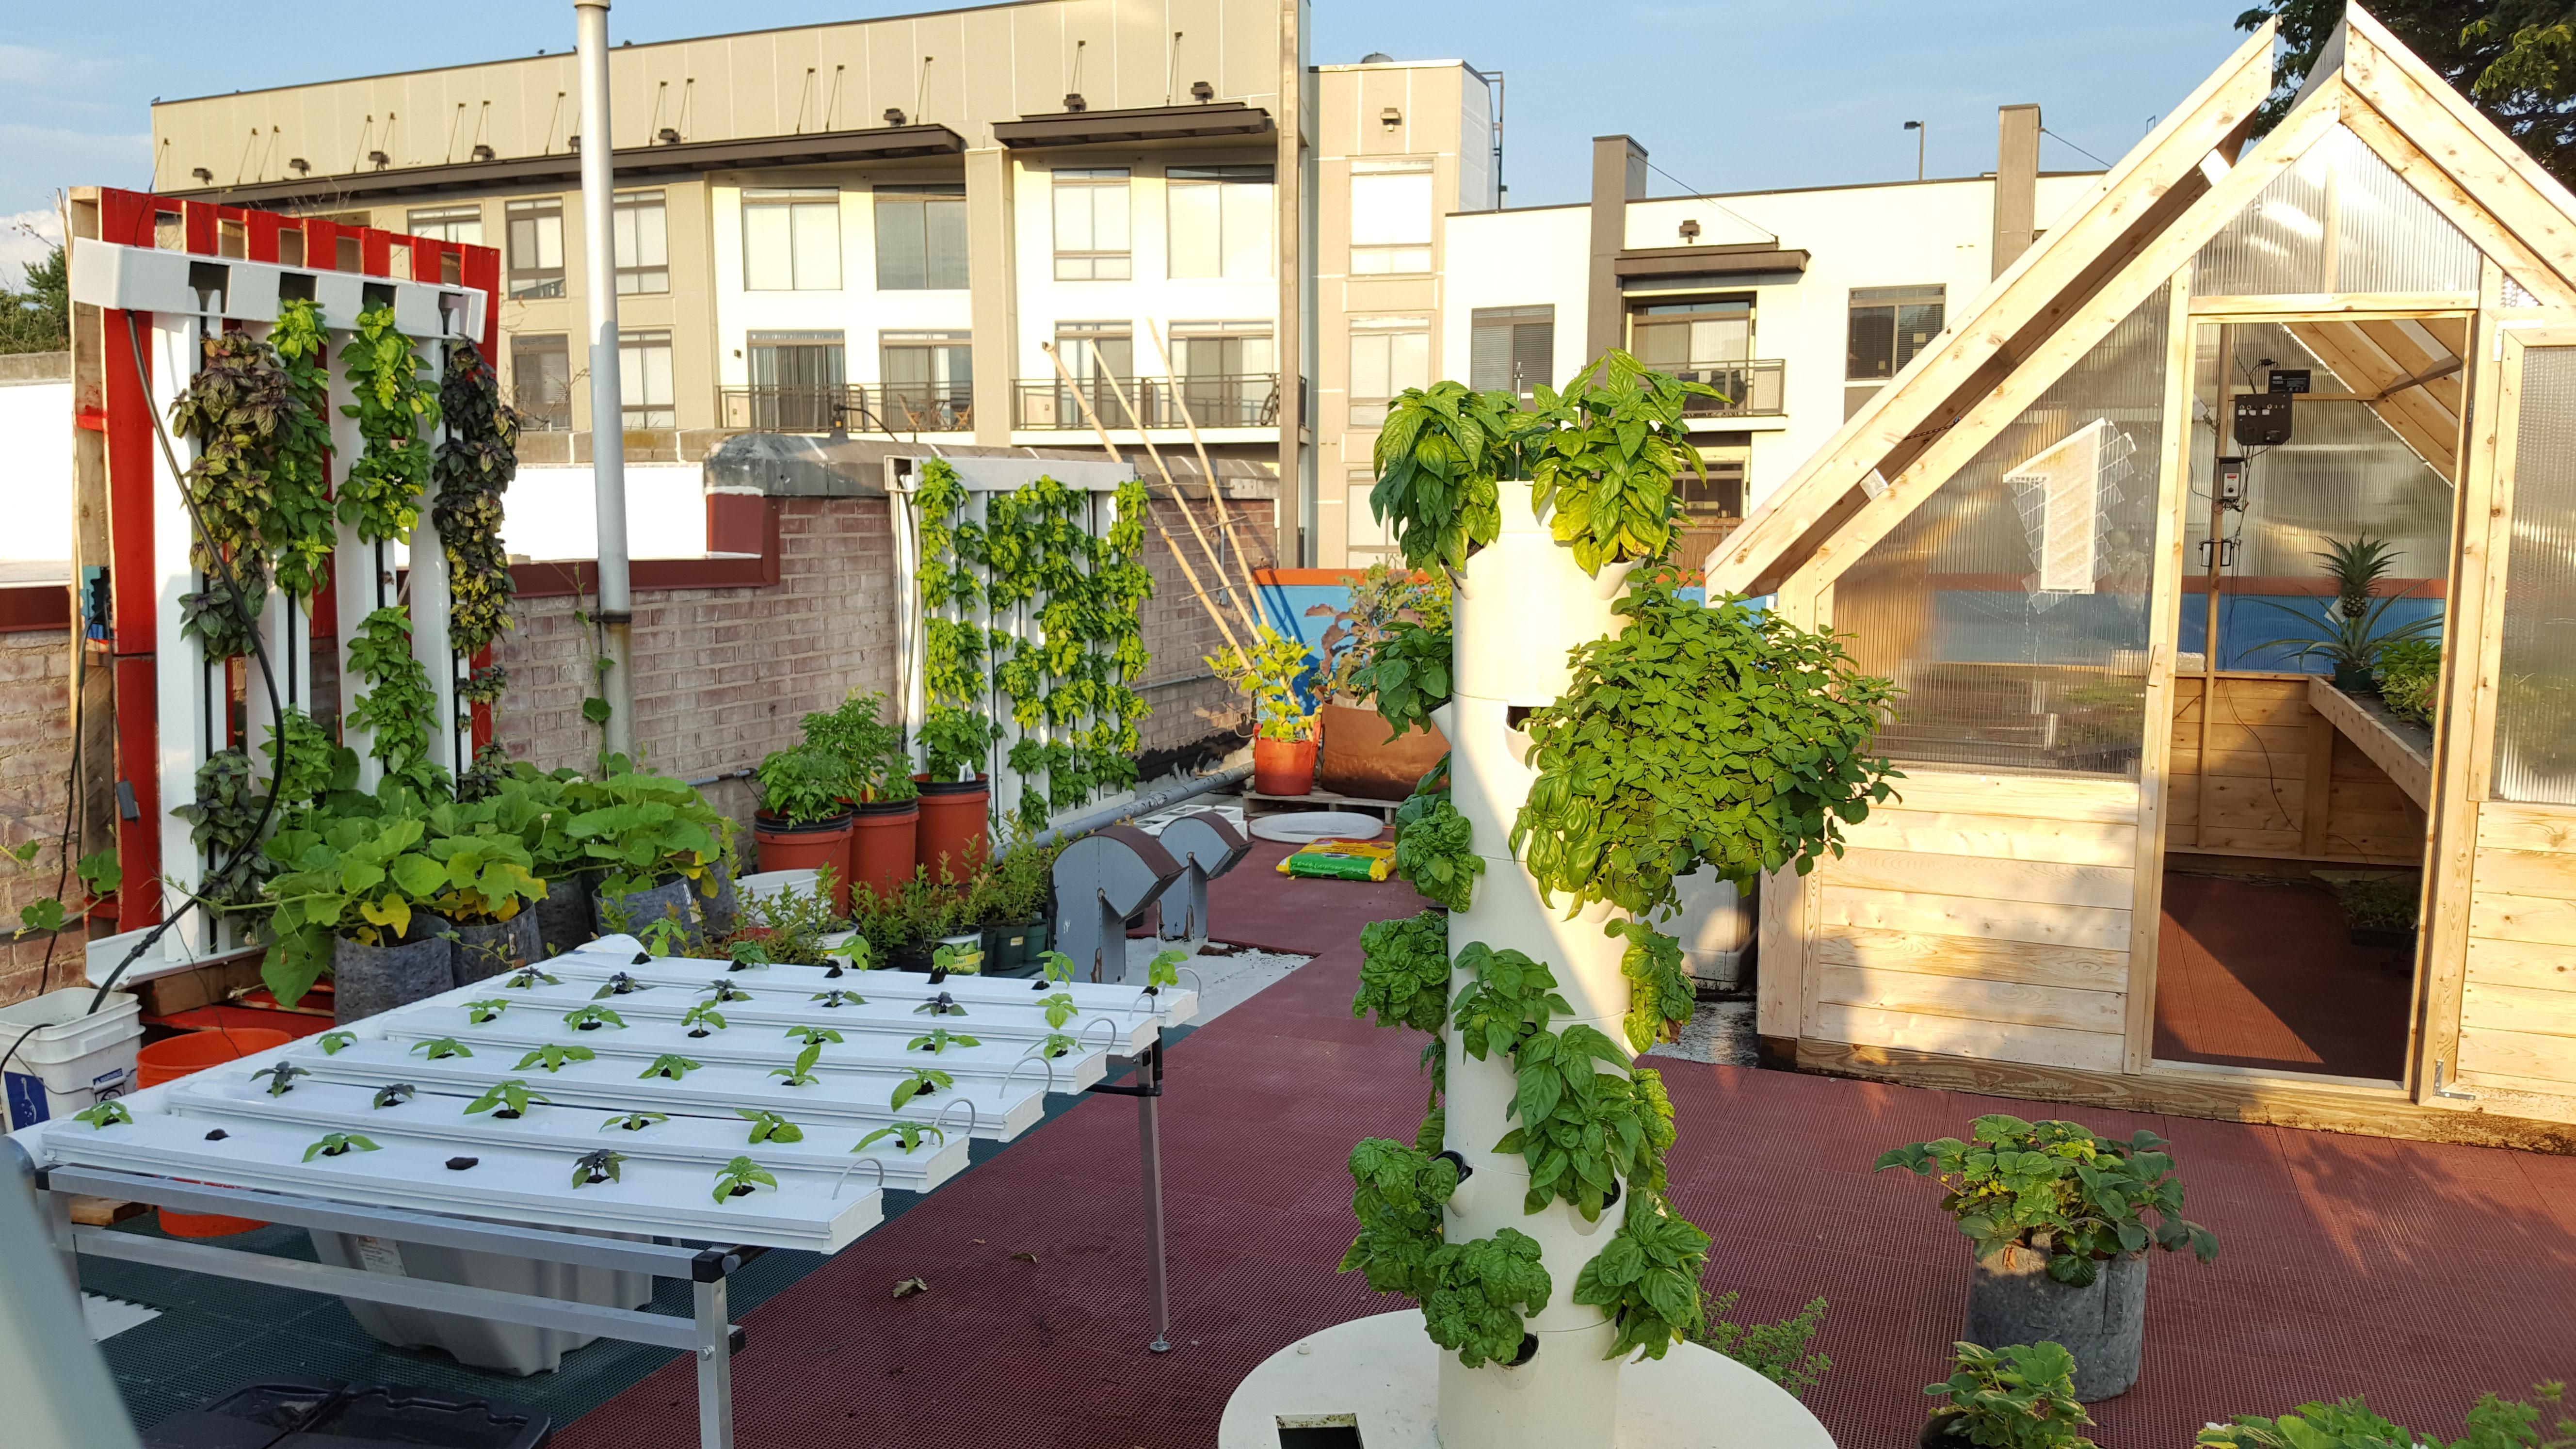 Rooftop Urban Farm Tour!